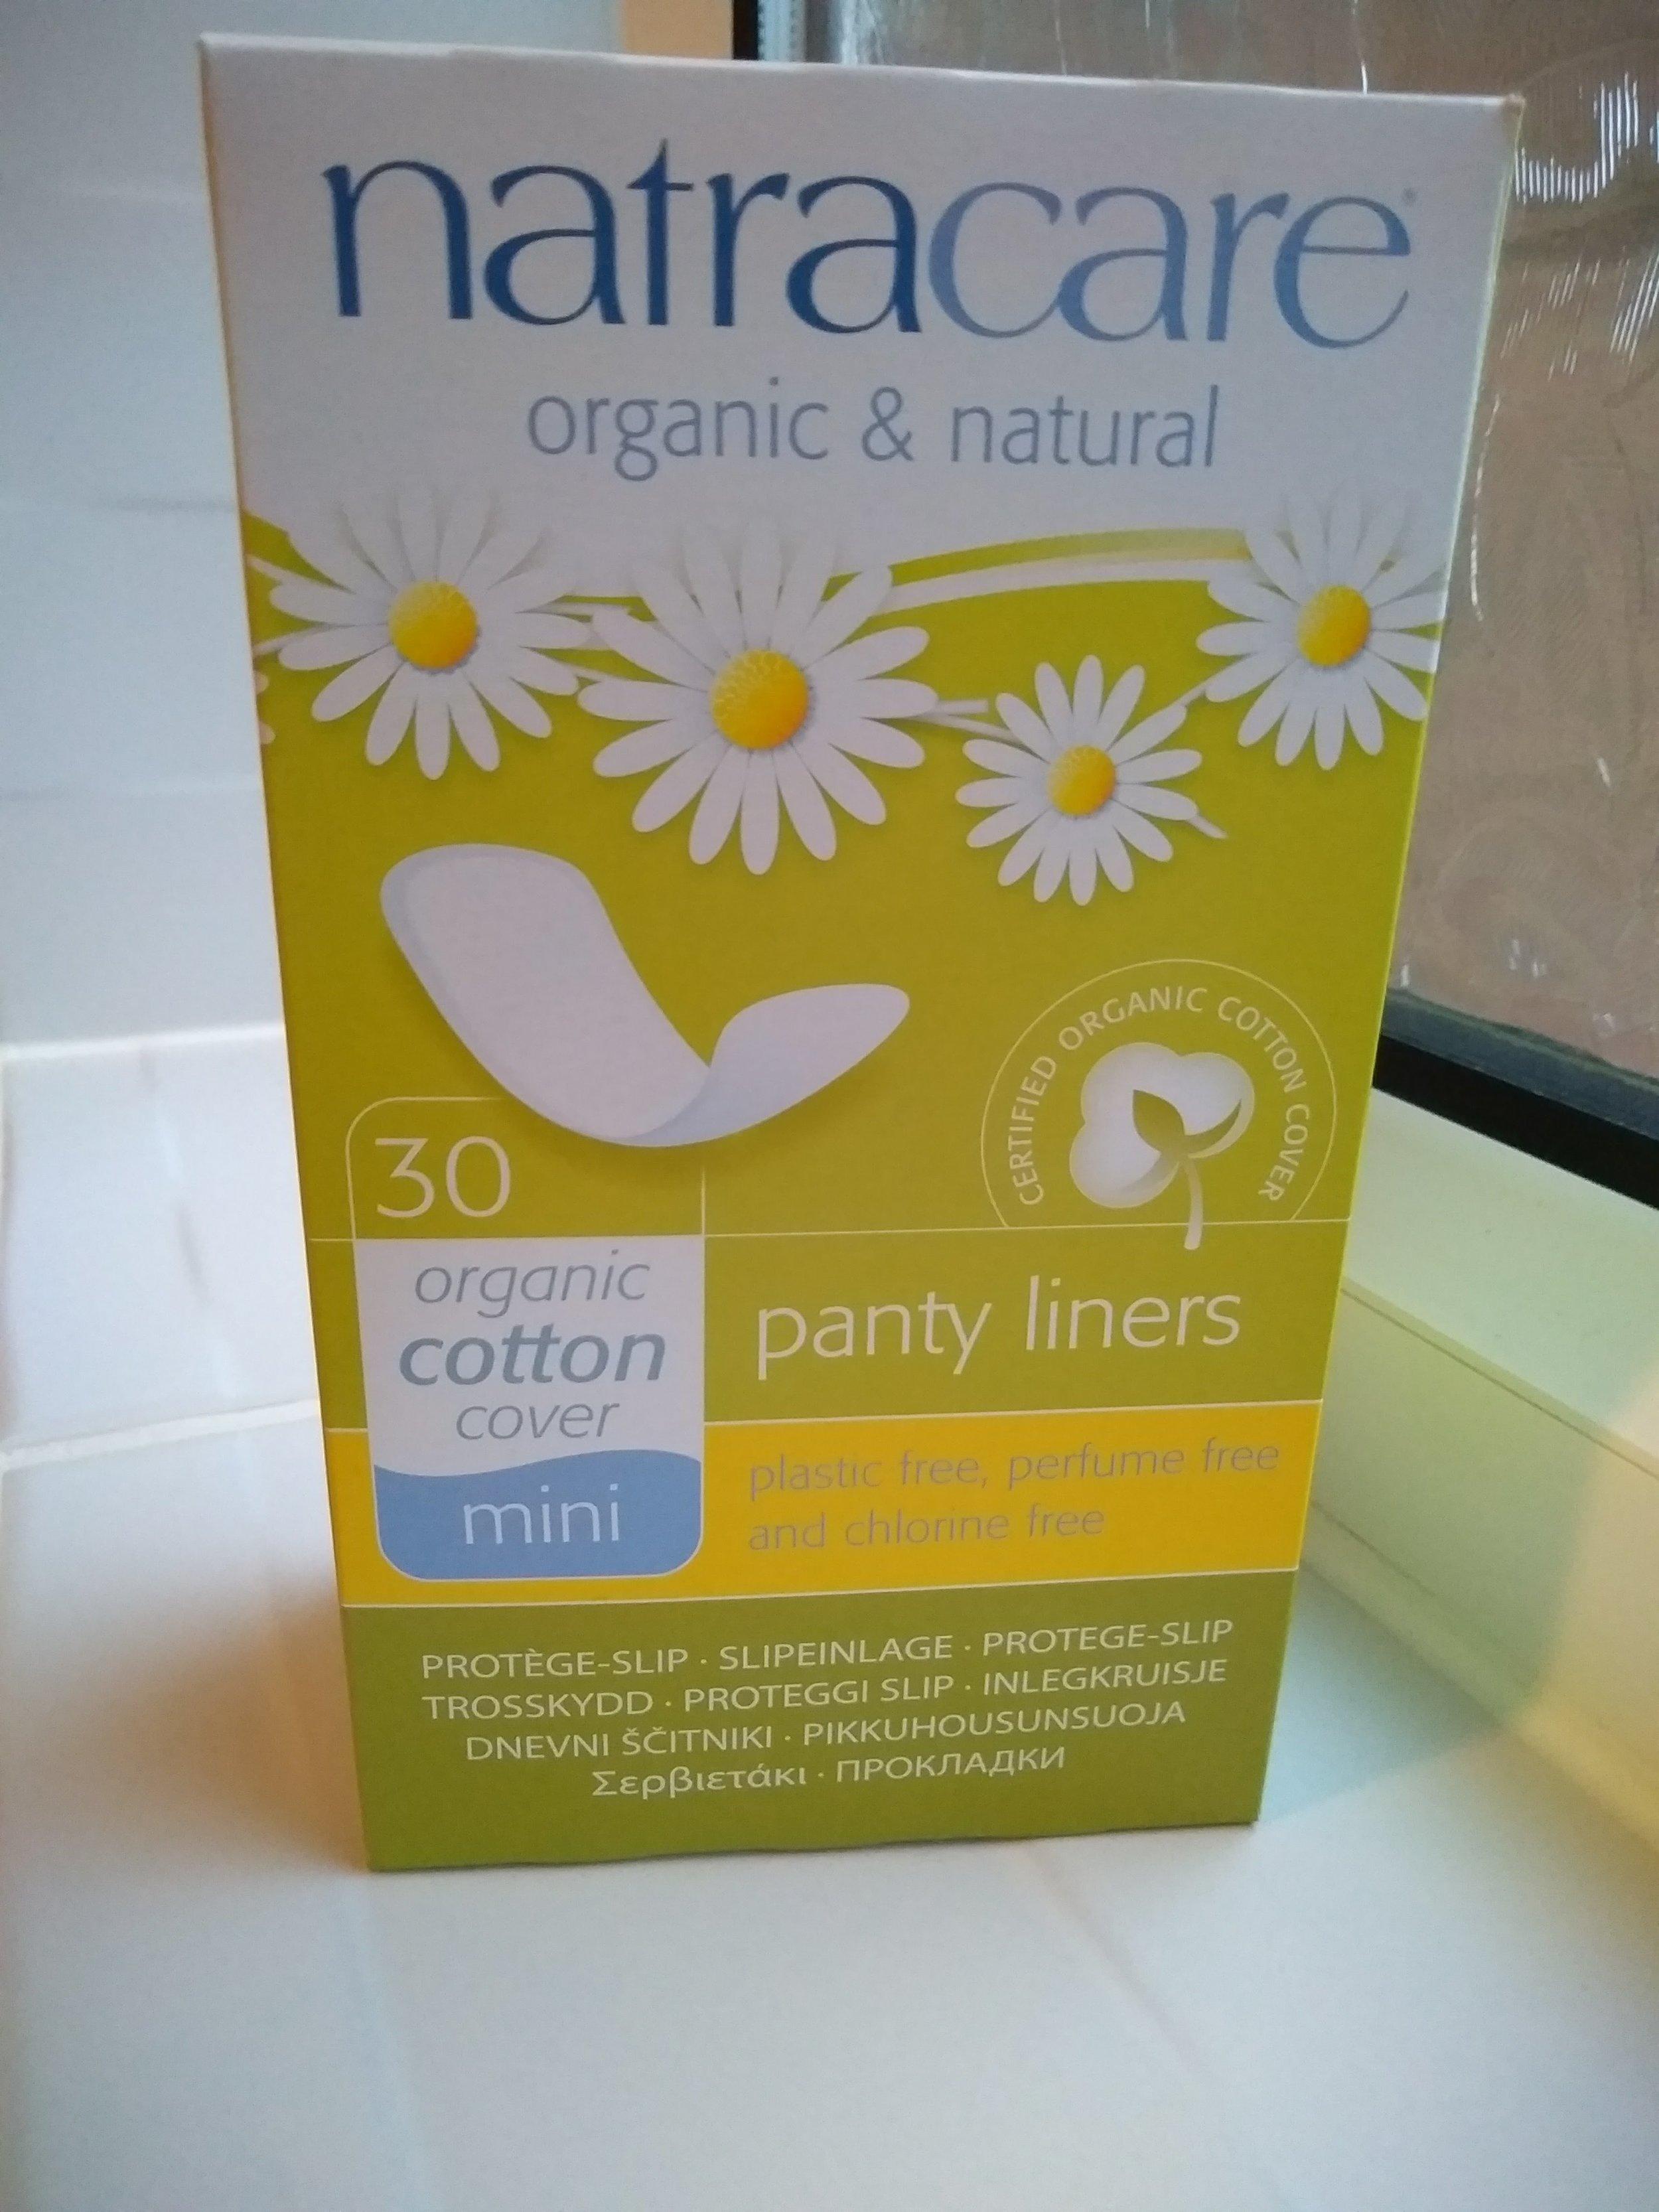 Plastic-free sanitary pads